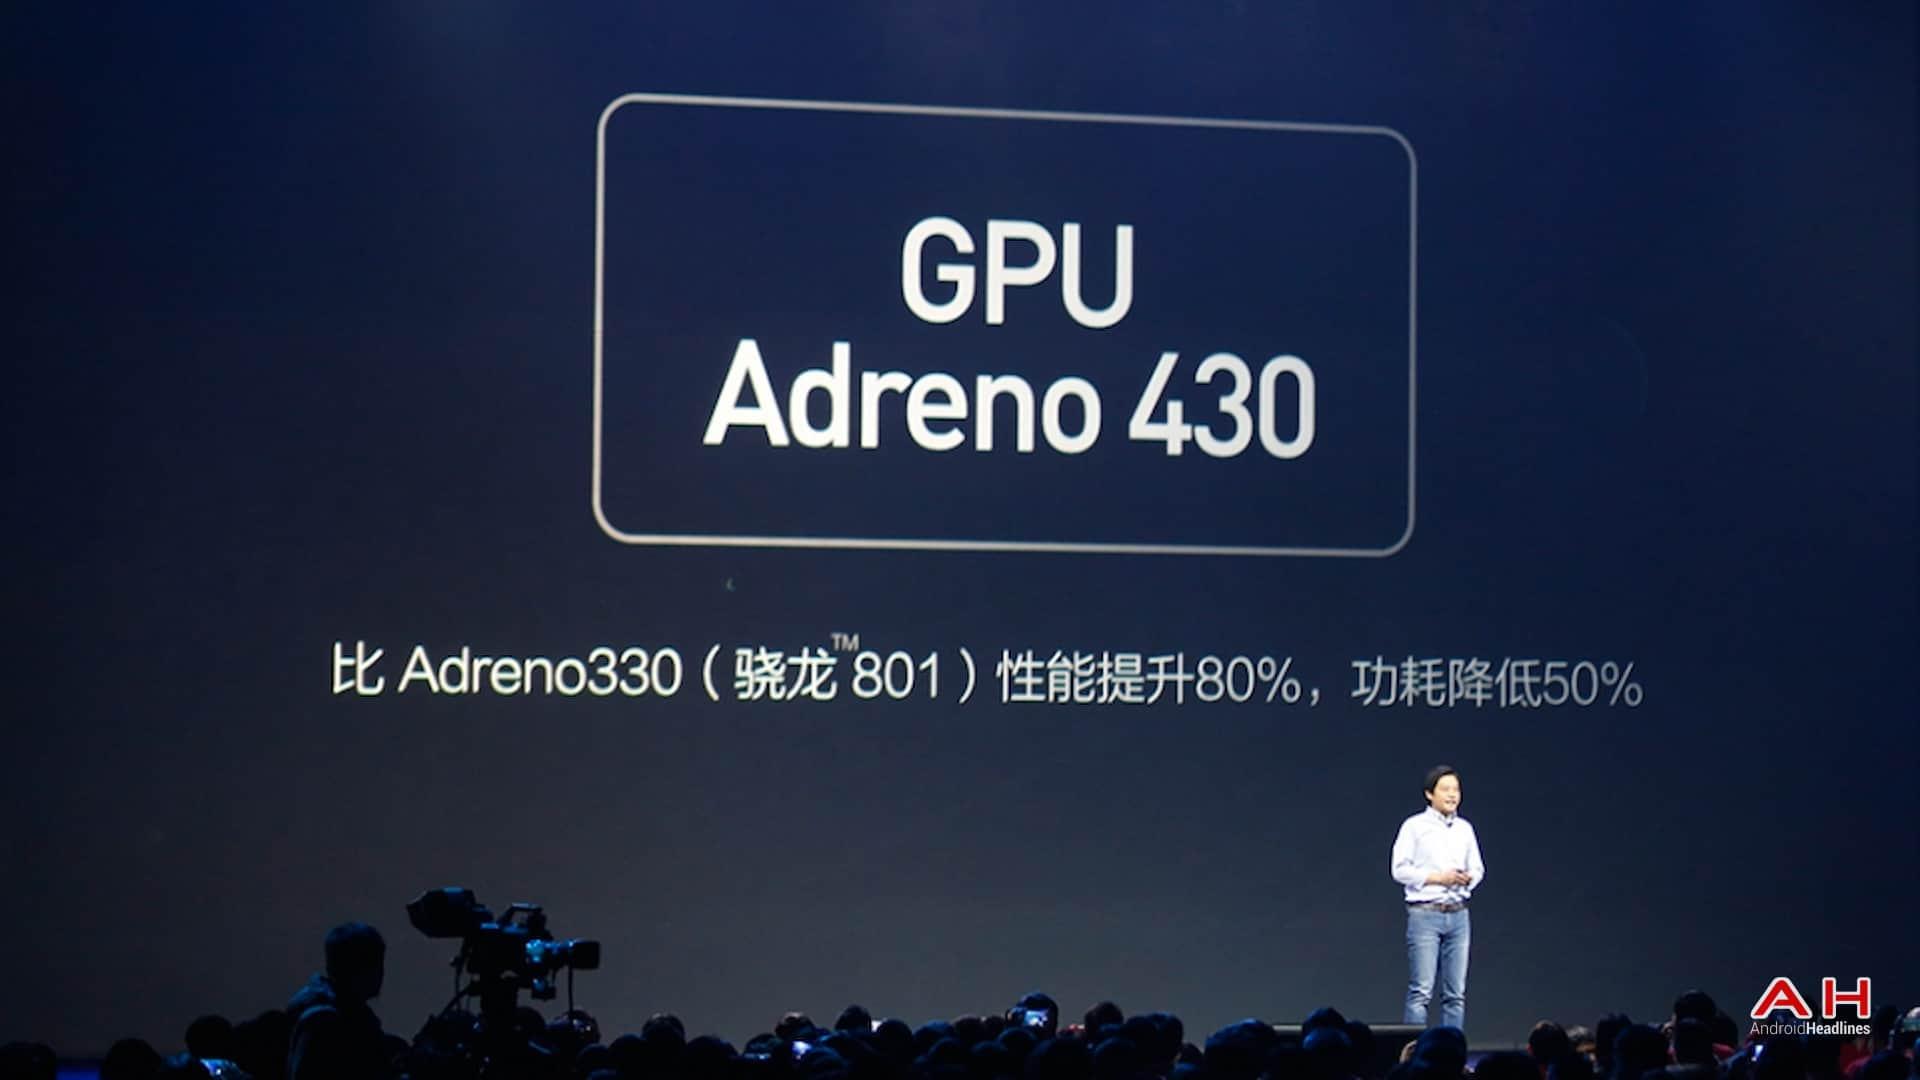 AH Xiaomi Note 14